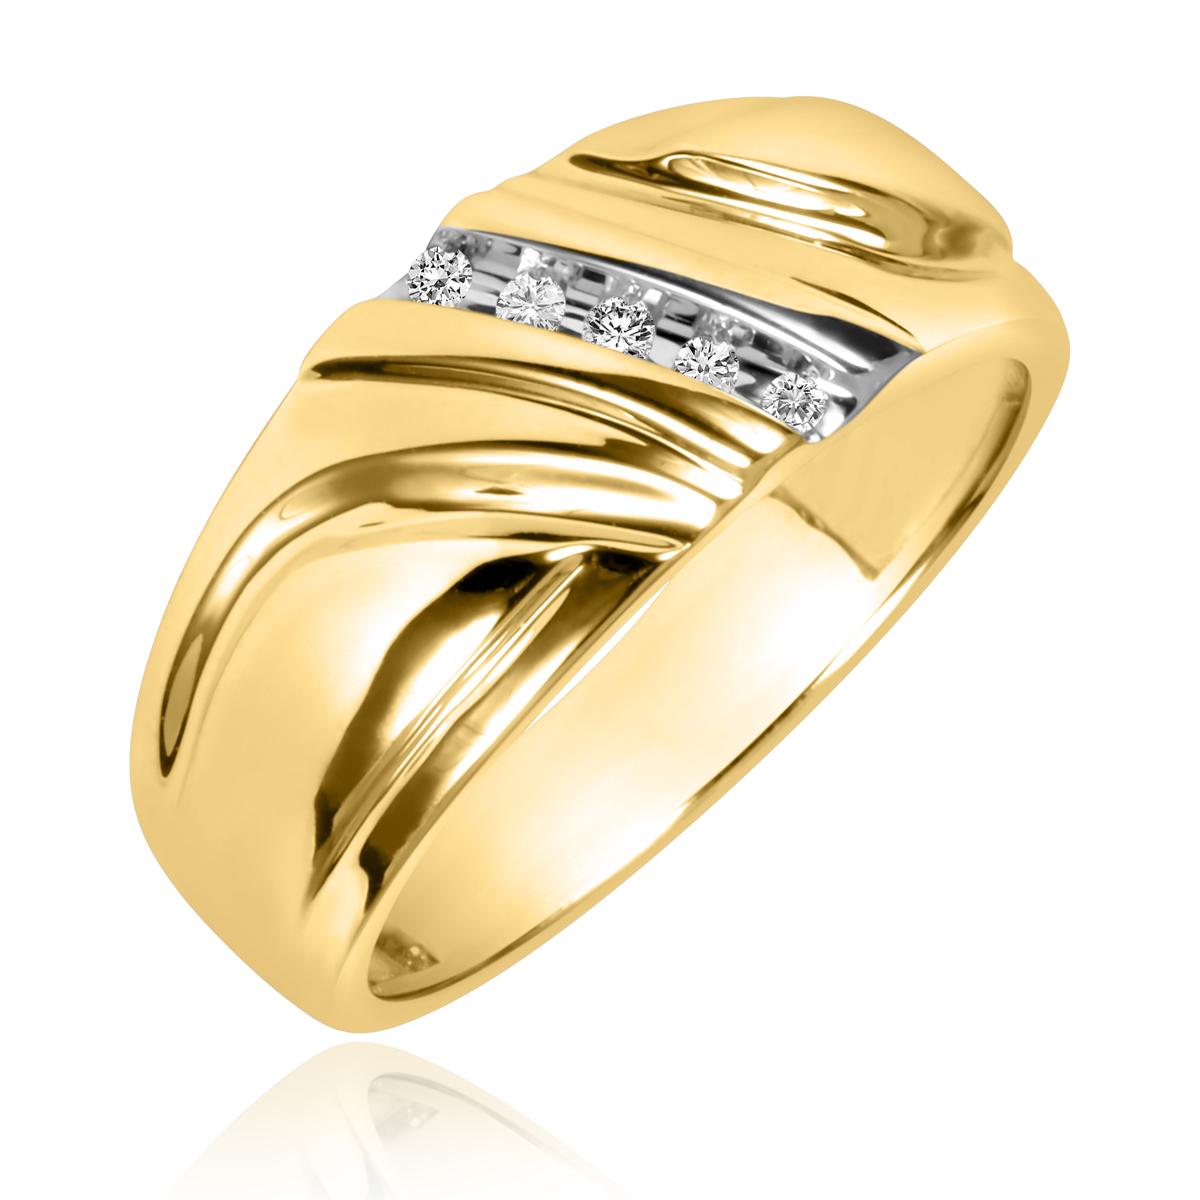 1/15 Carat T.W. Round Cut Diamond Men's Wedding Band 10K Yellow Gold- Size 8